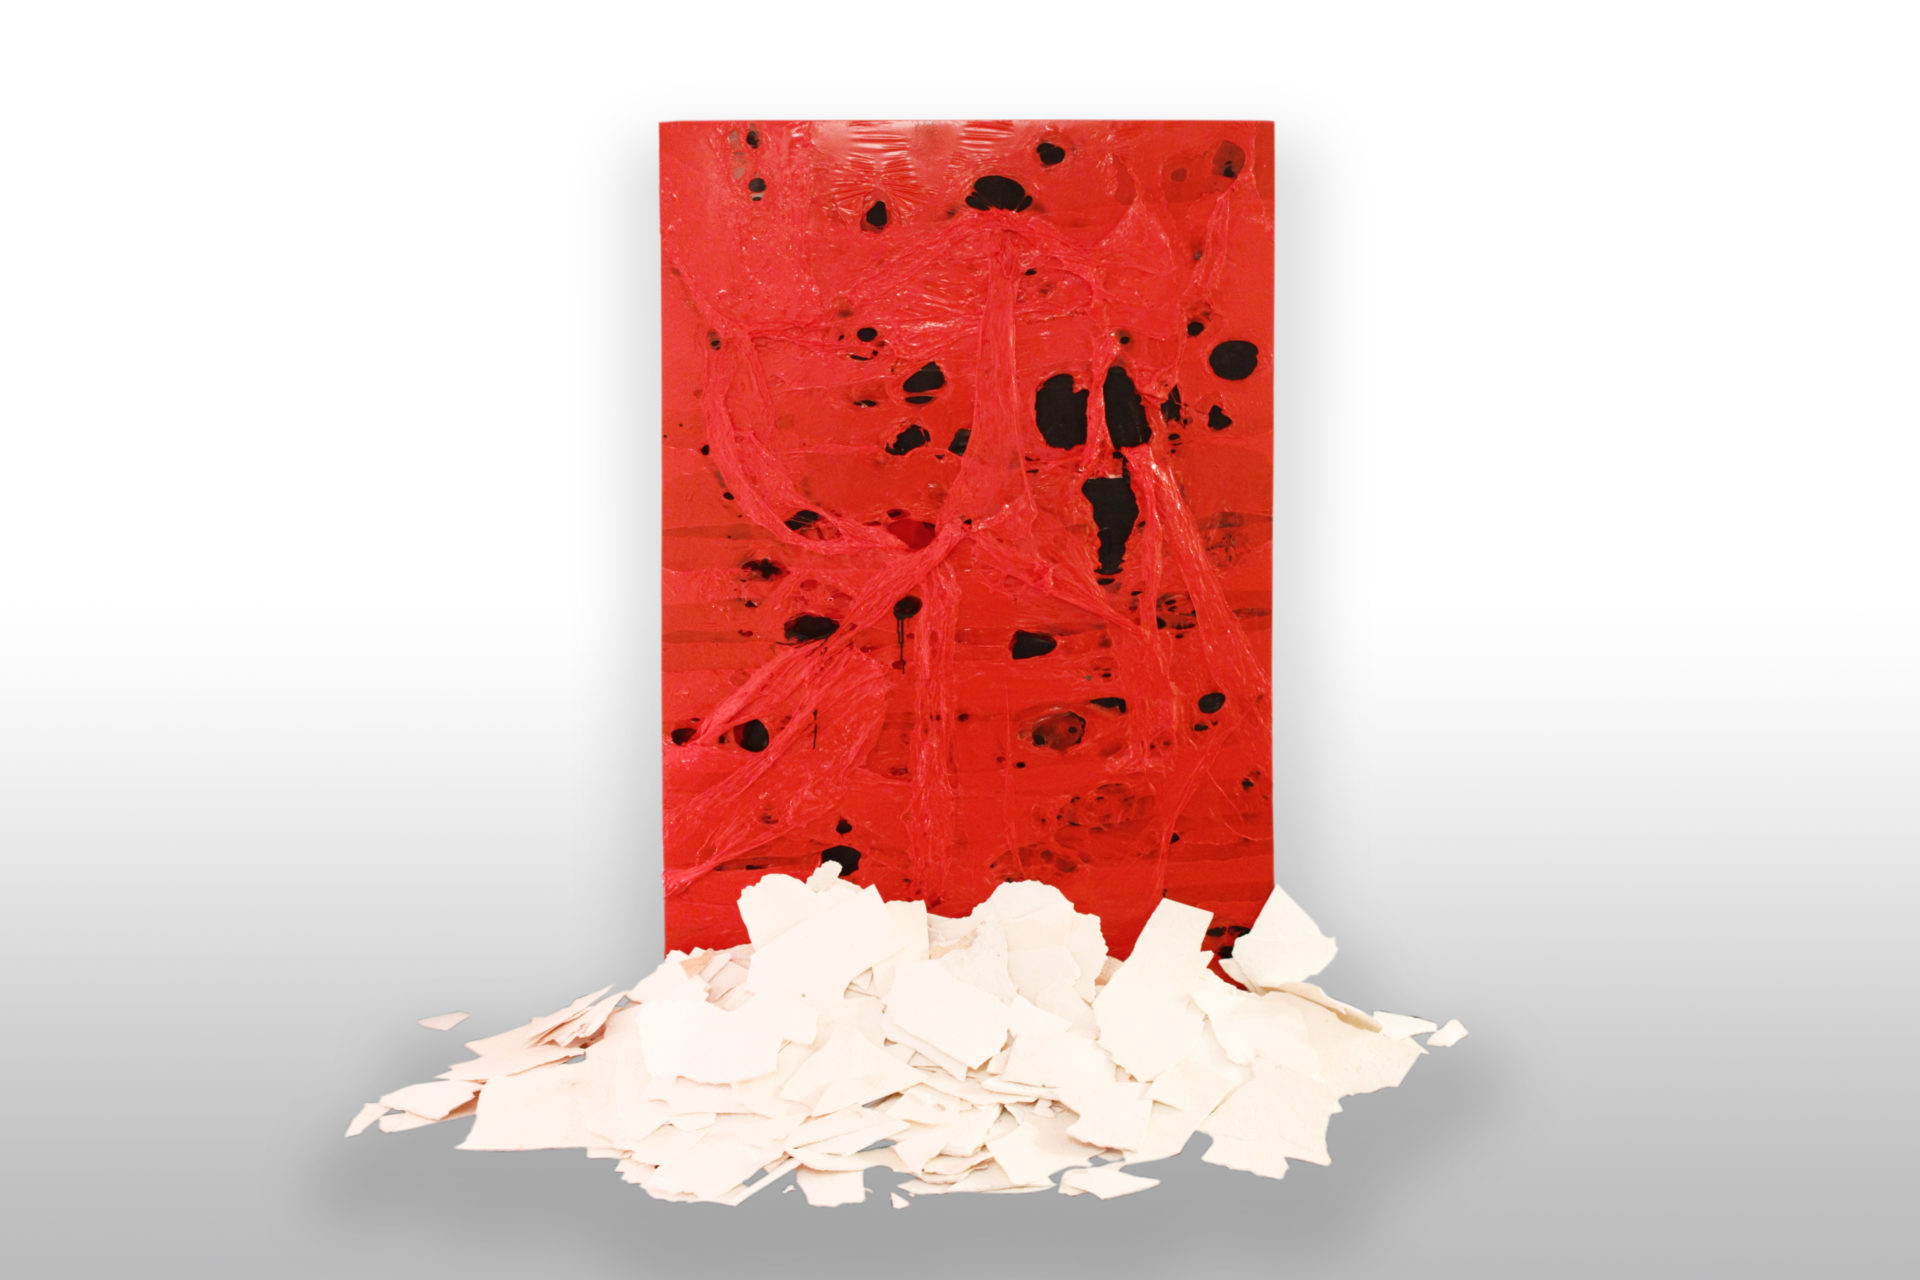 Bury Burri  |  rôzne médiá na plátne, polyuretán  |  200 x 124  |  2016